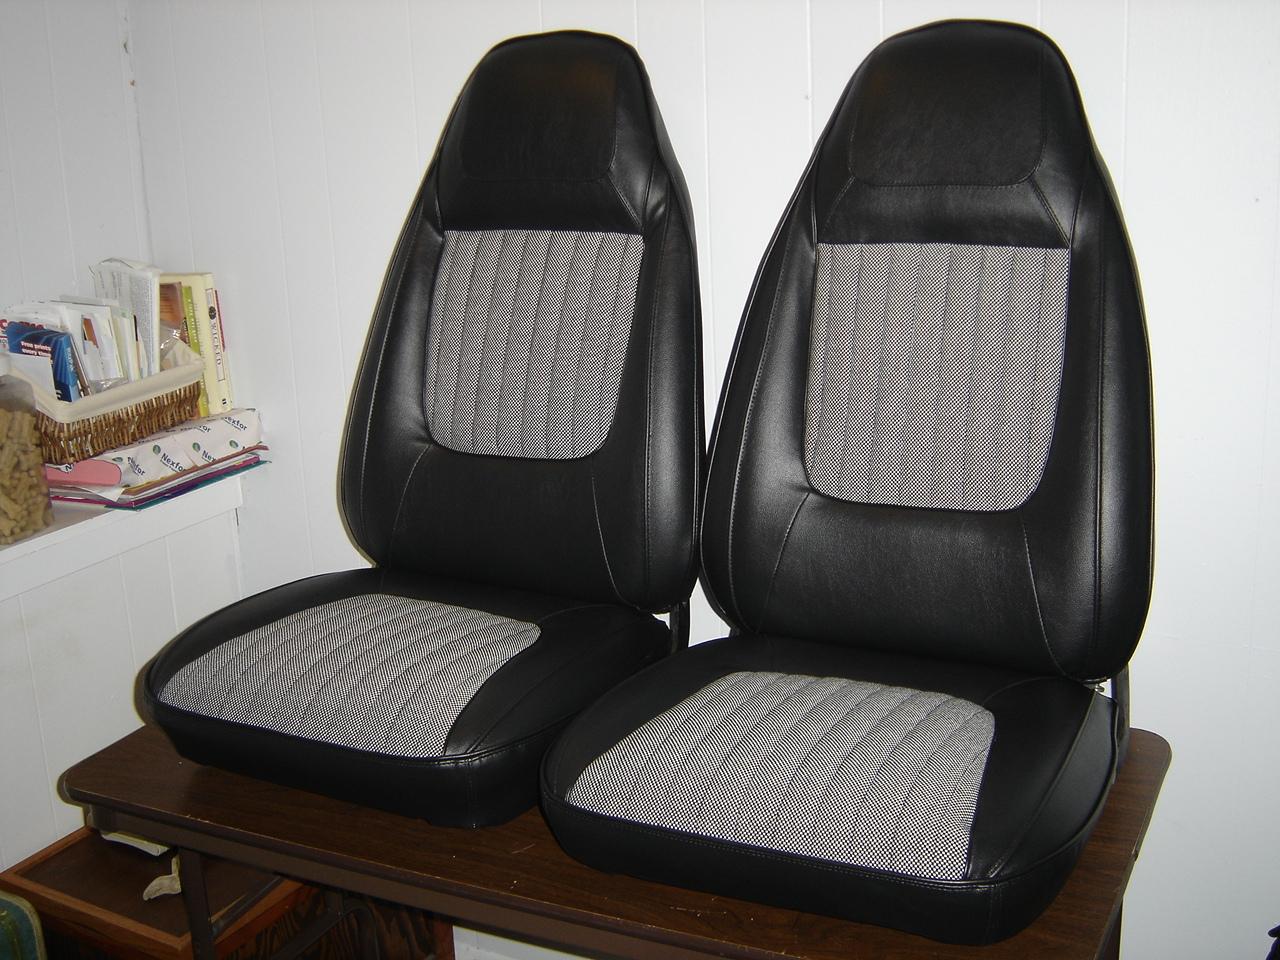 1970 Dodge Challenger Bucket Seats Amp Rear Seat Classic